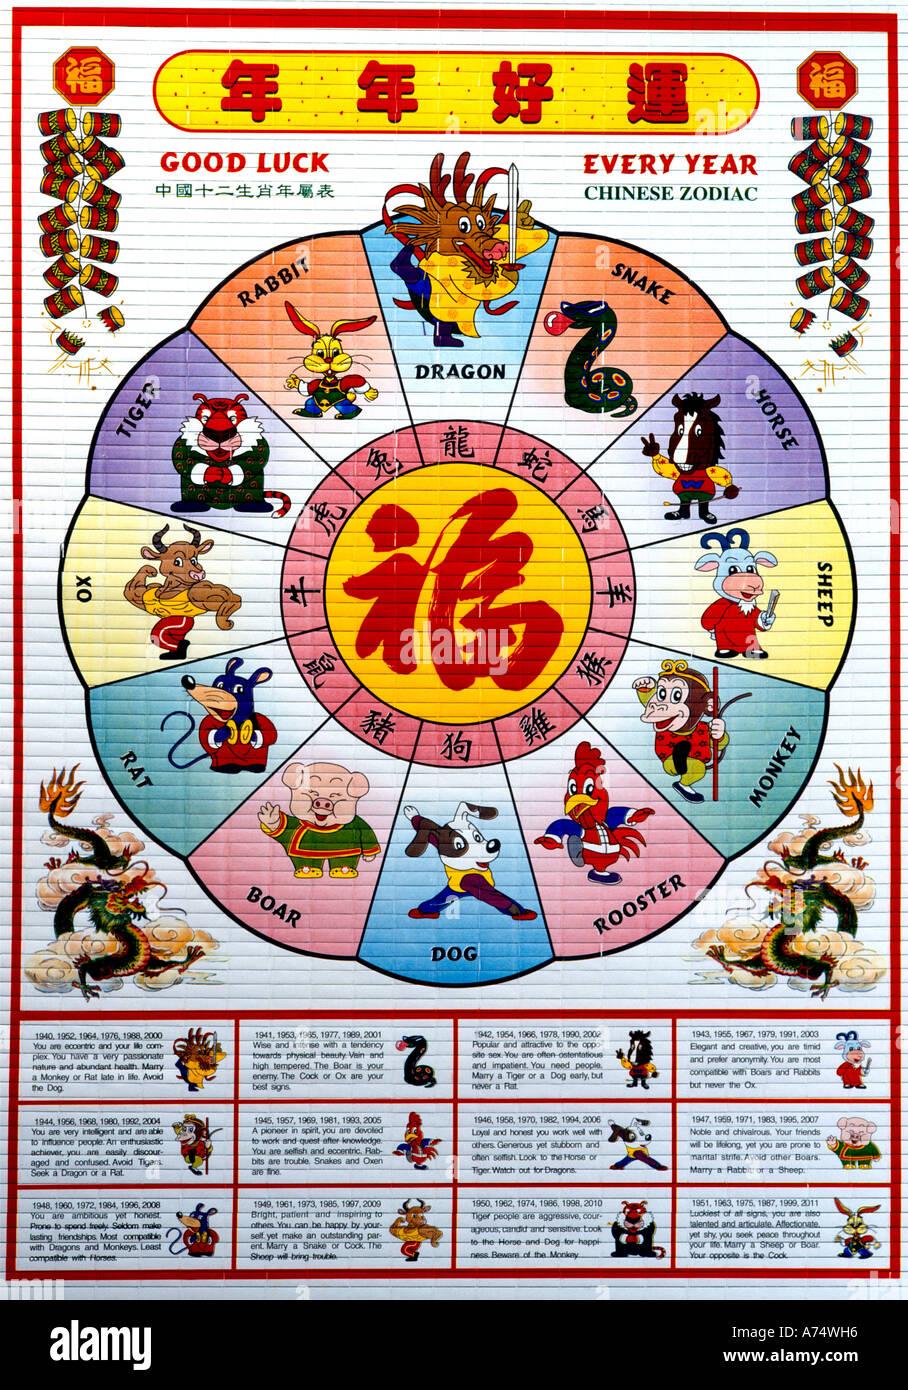 Calendario Chino.Calendario Chino Foto Imagen De Stock 6699733 Alamy